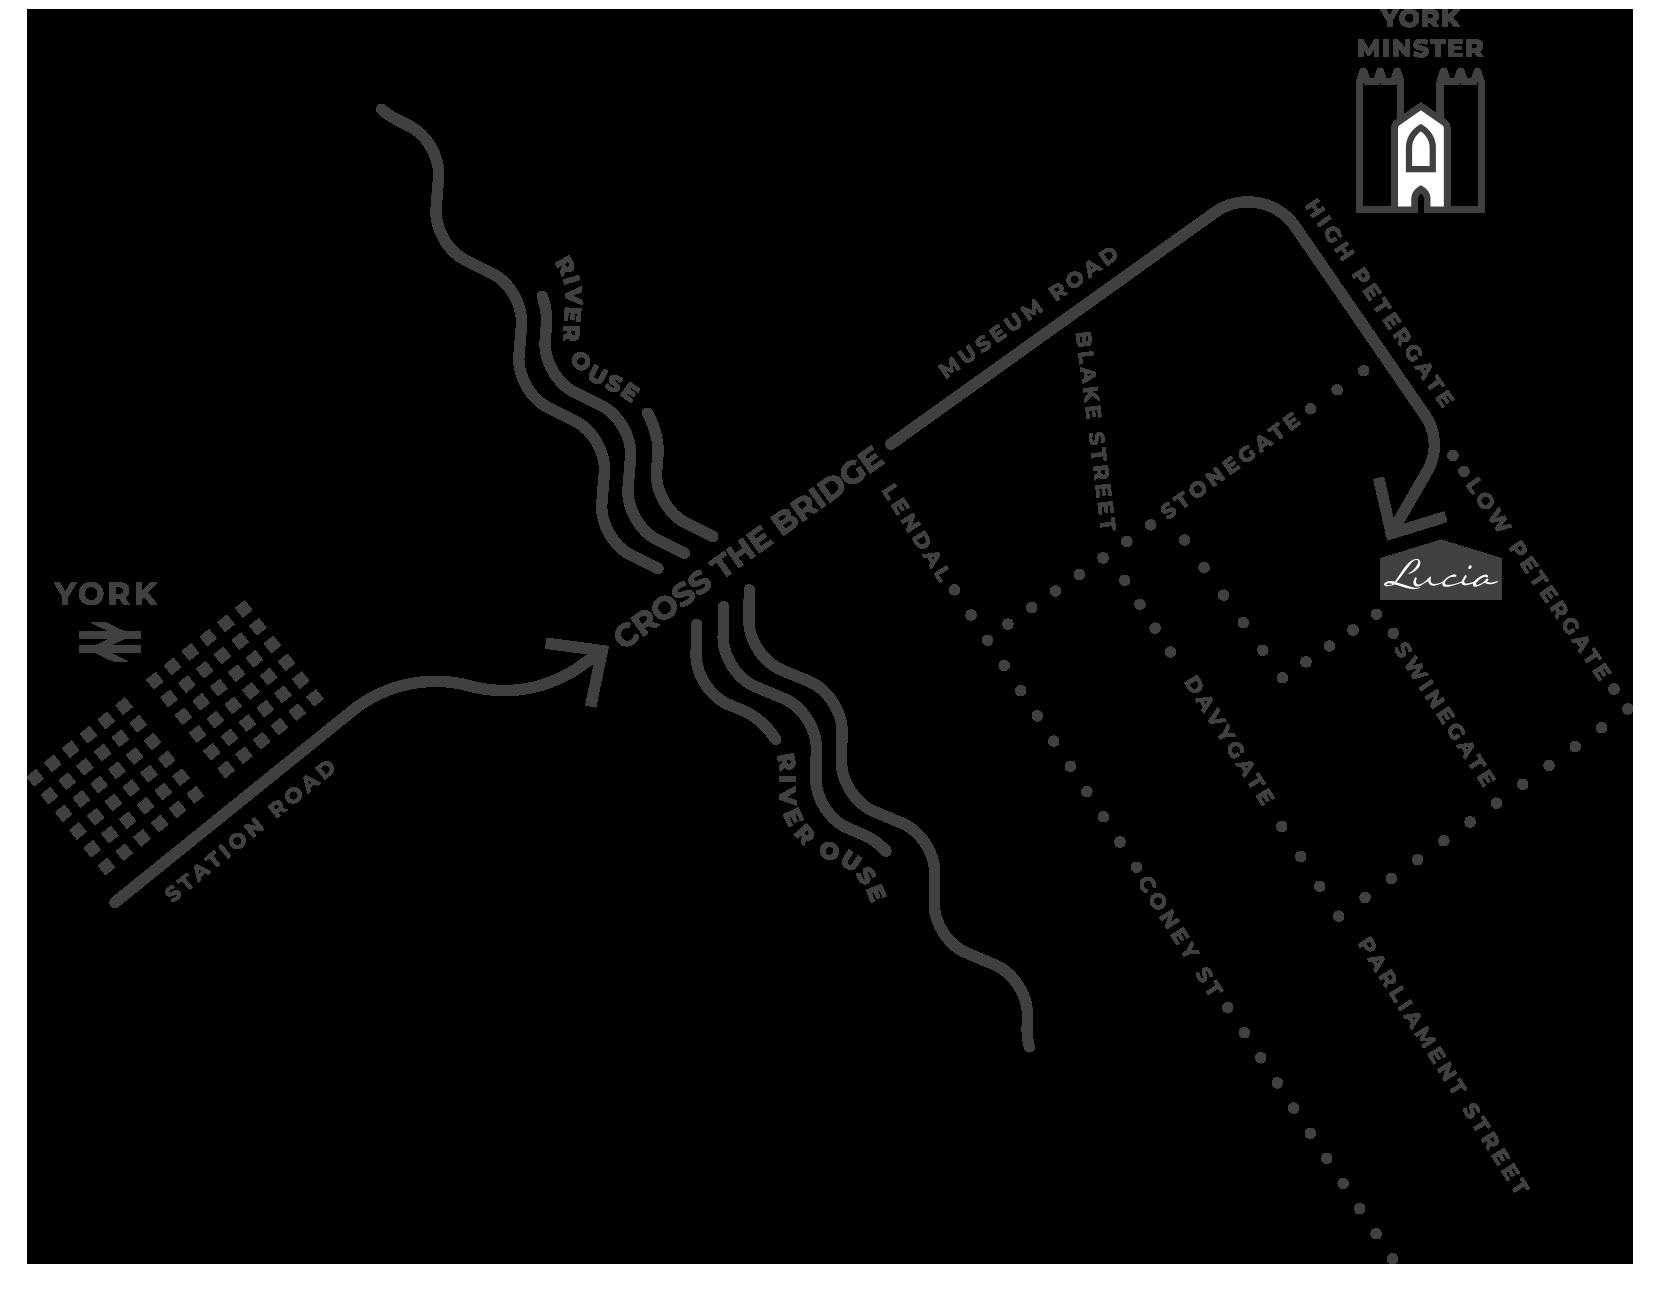 Lucia York Map